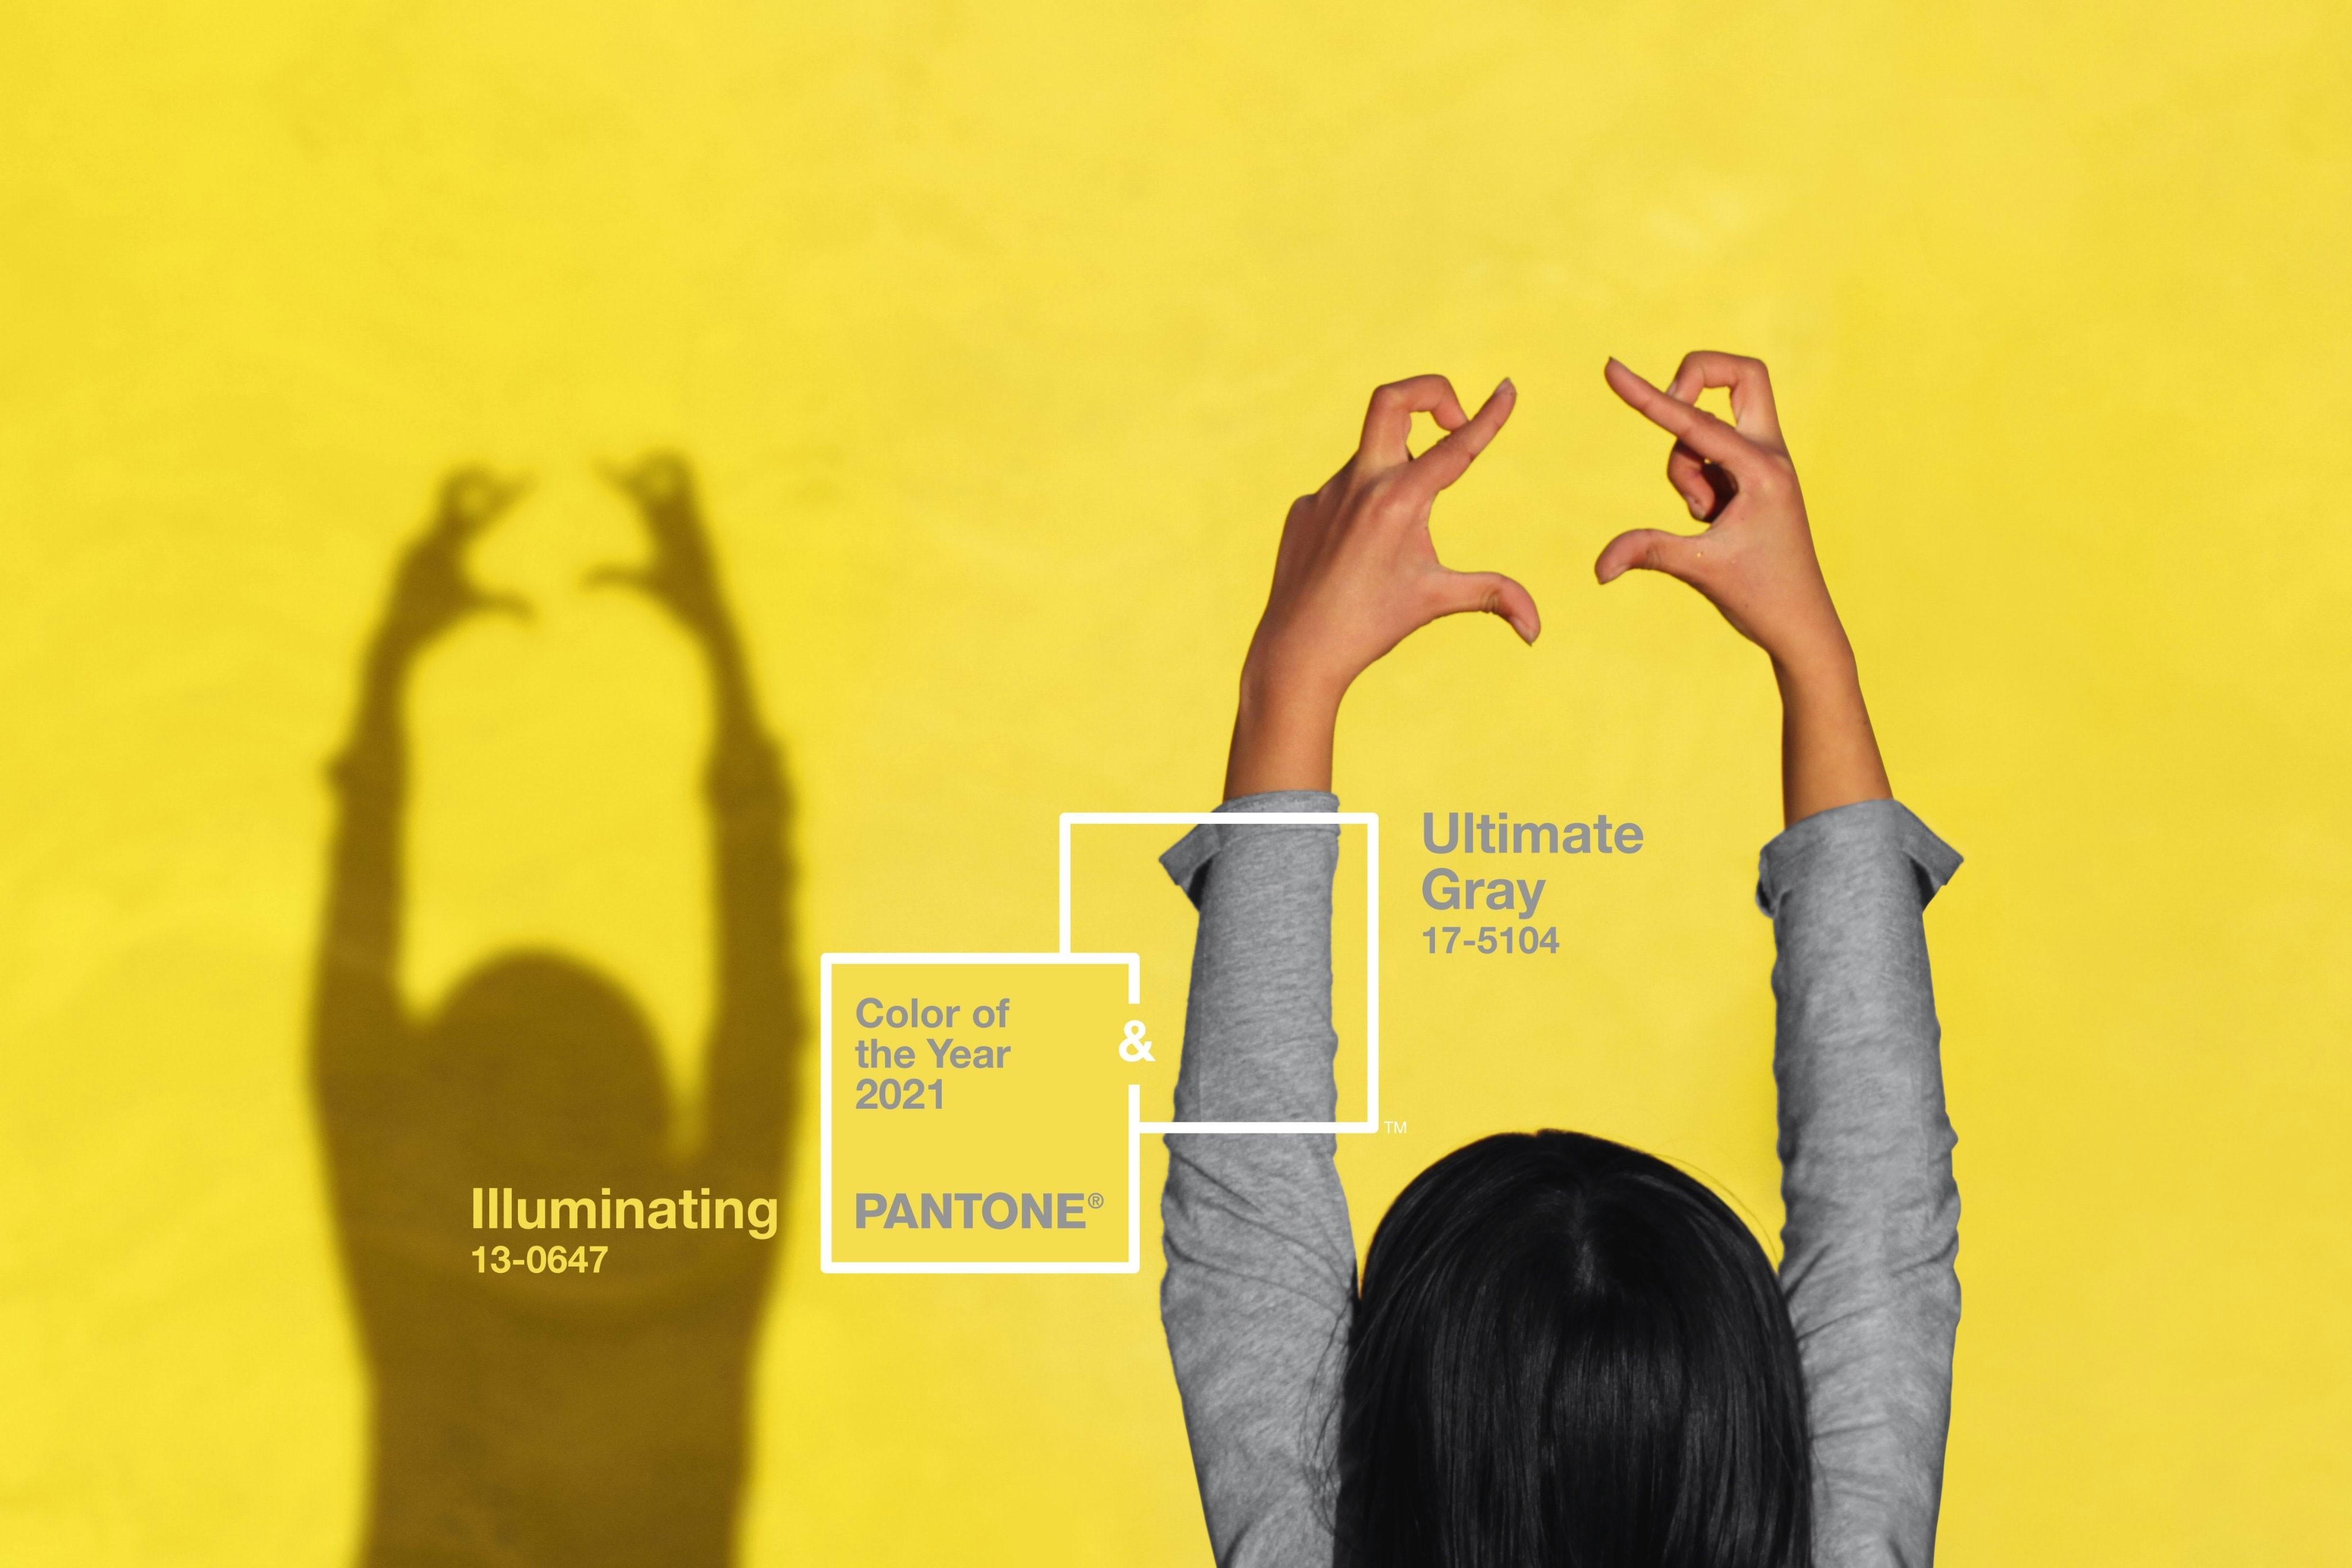 Институт цвета Pantone выбрал два цвета 2021 года